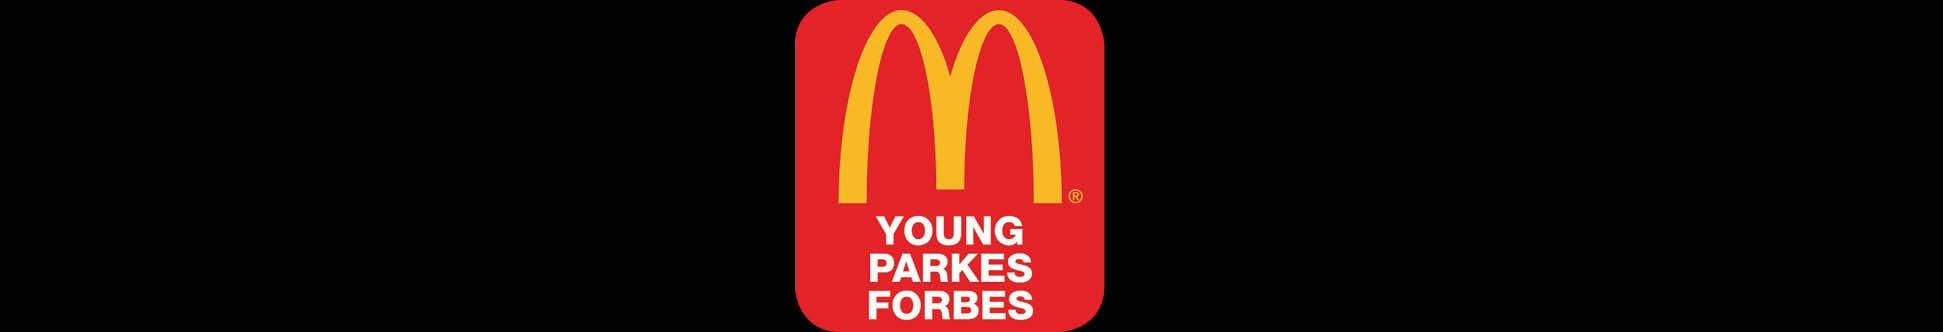 McDonalds - major sponsor 2018